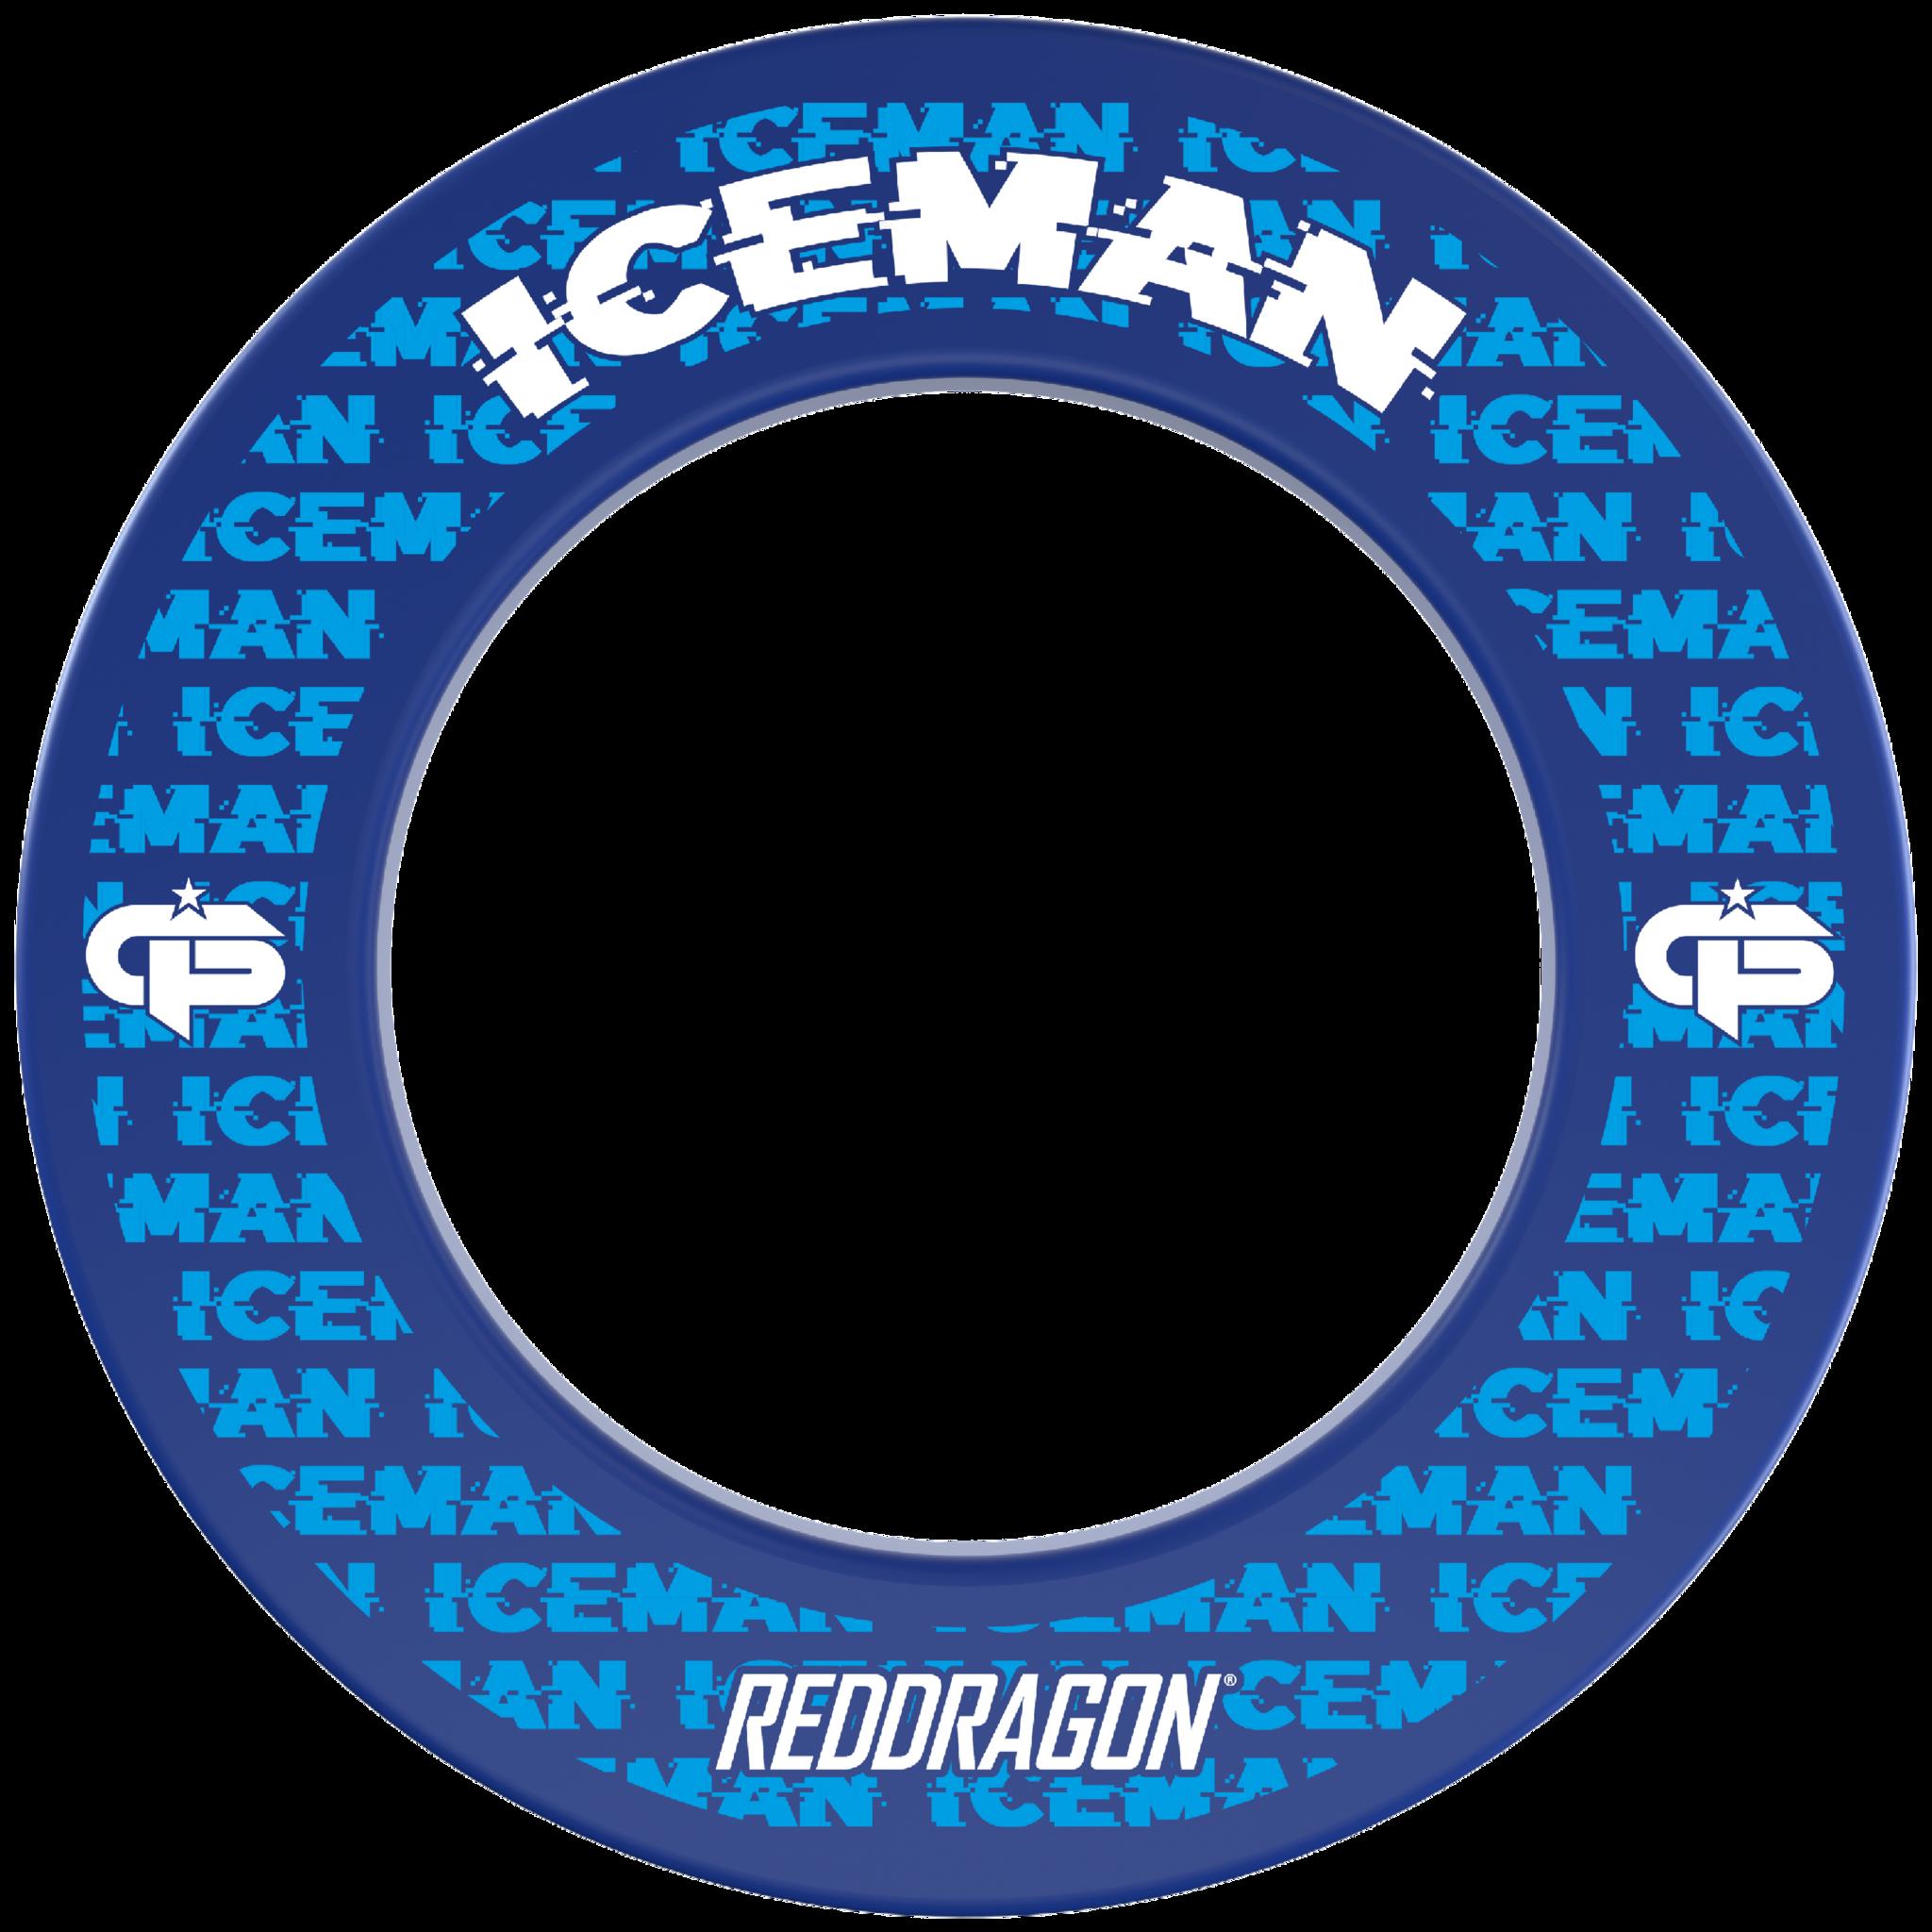 Gerwyn Price Iceman Dartboard Surround